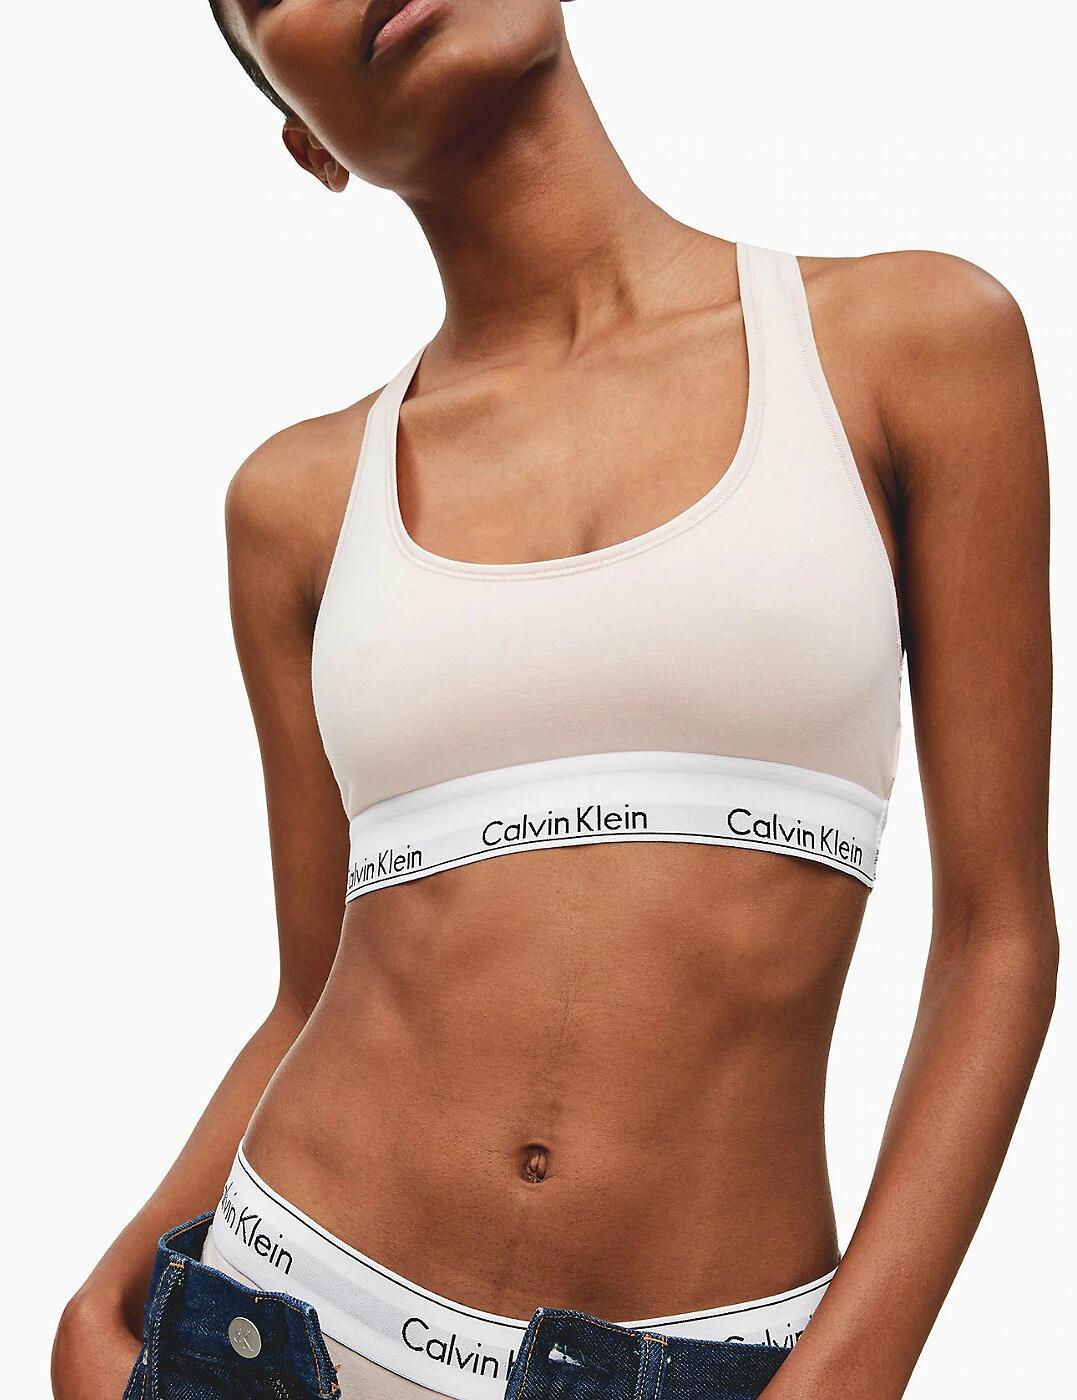 F3785E Calvin Klein Modern Cotton Bralette Bra Top - F3785E Nymphs Thigh